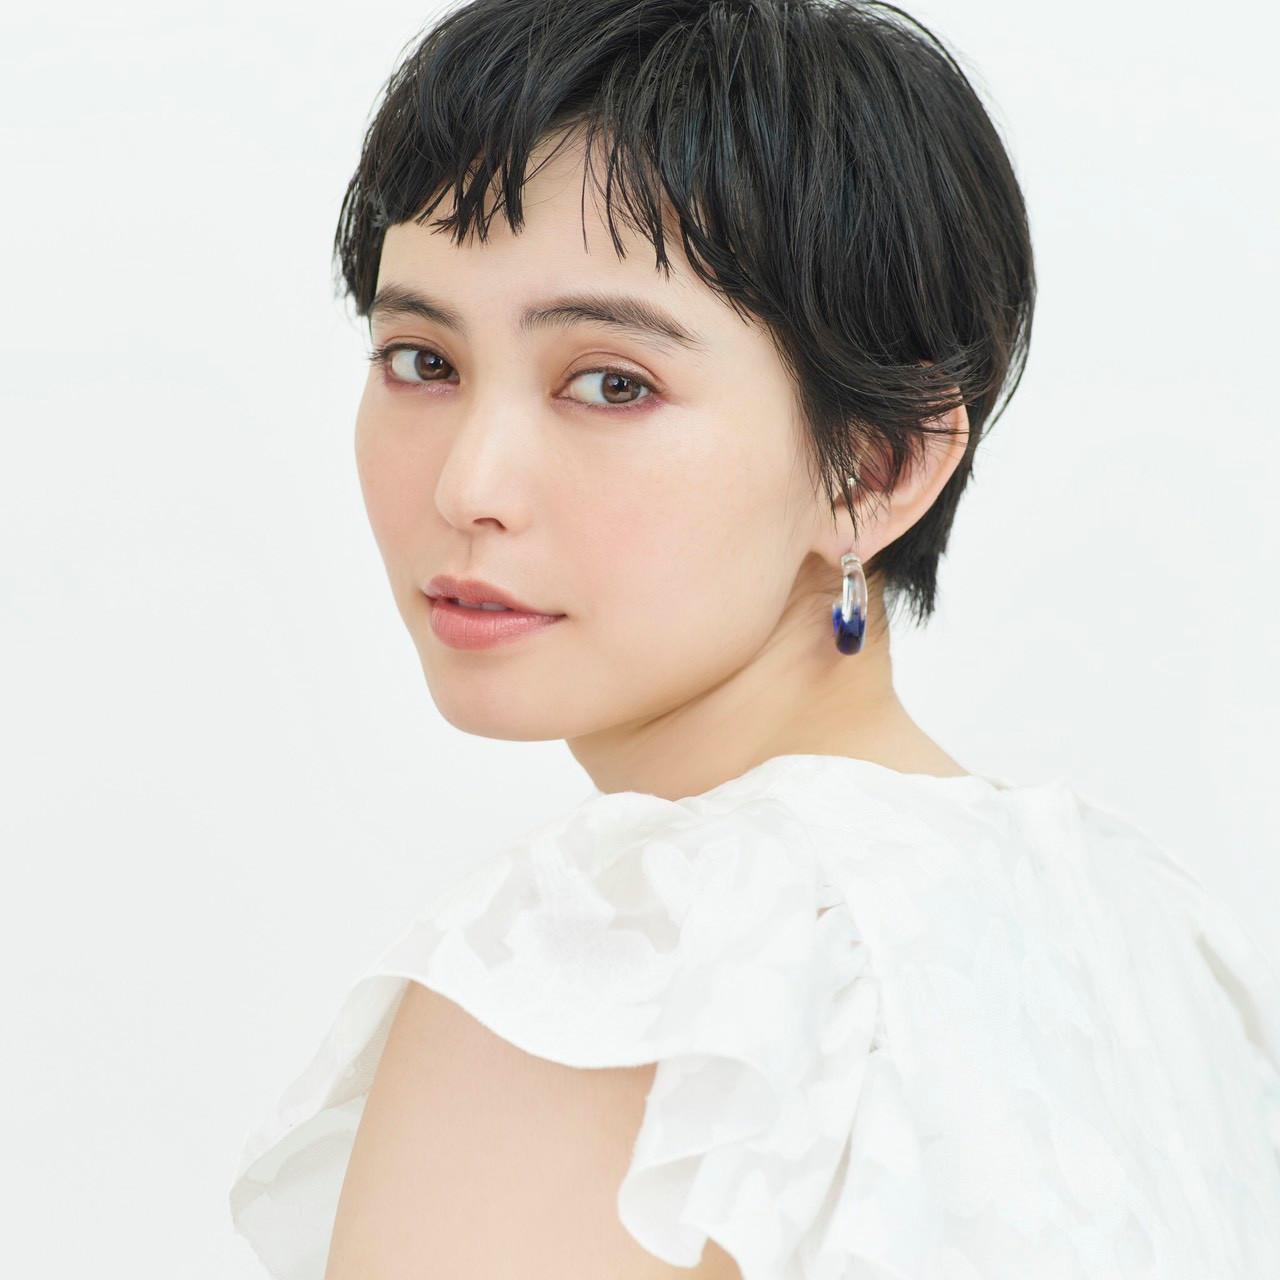 photo by NAOTO HAYASAKA